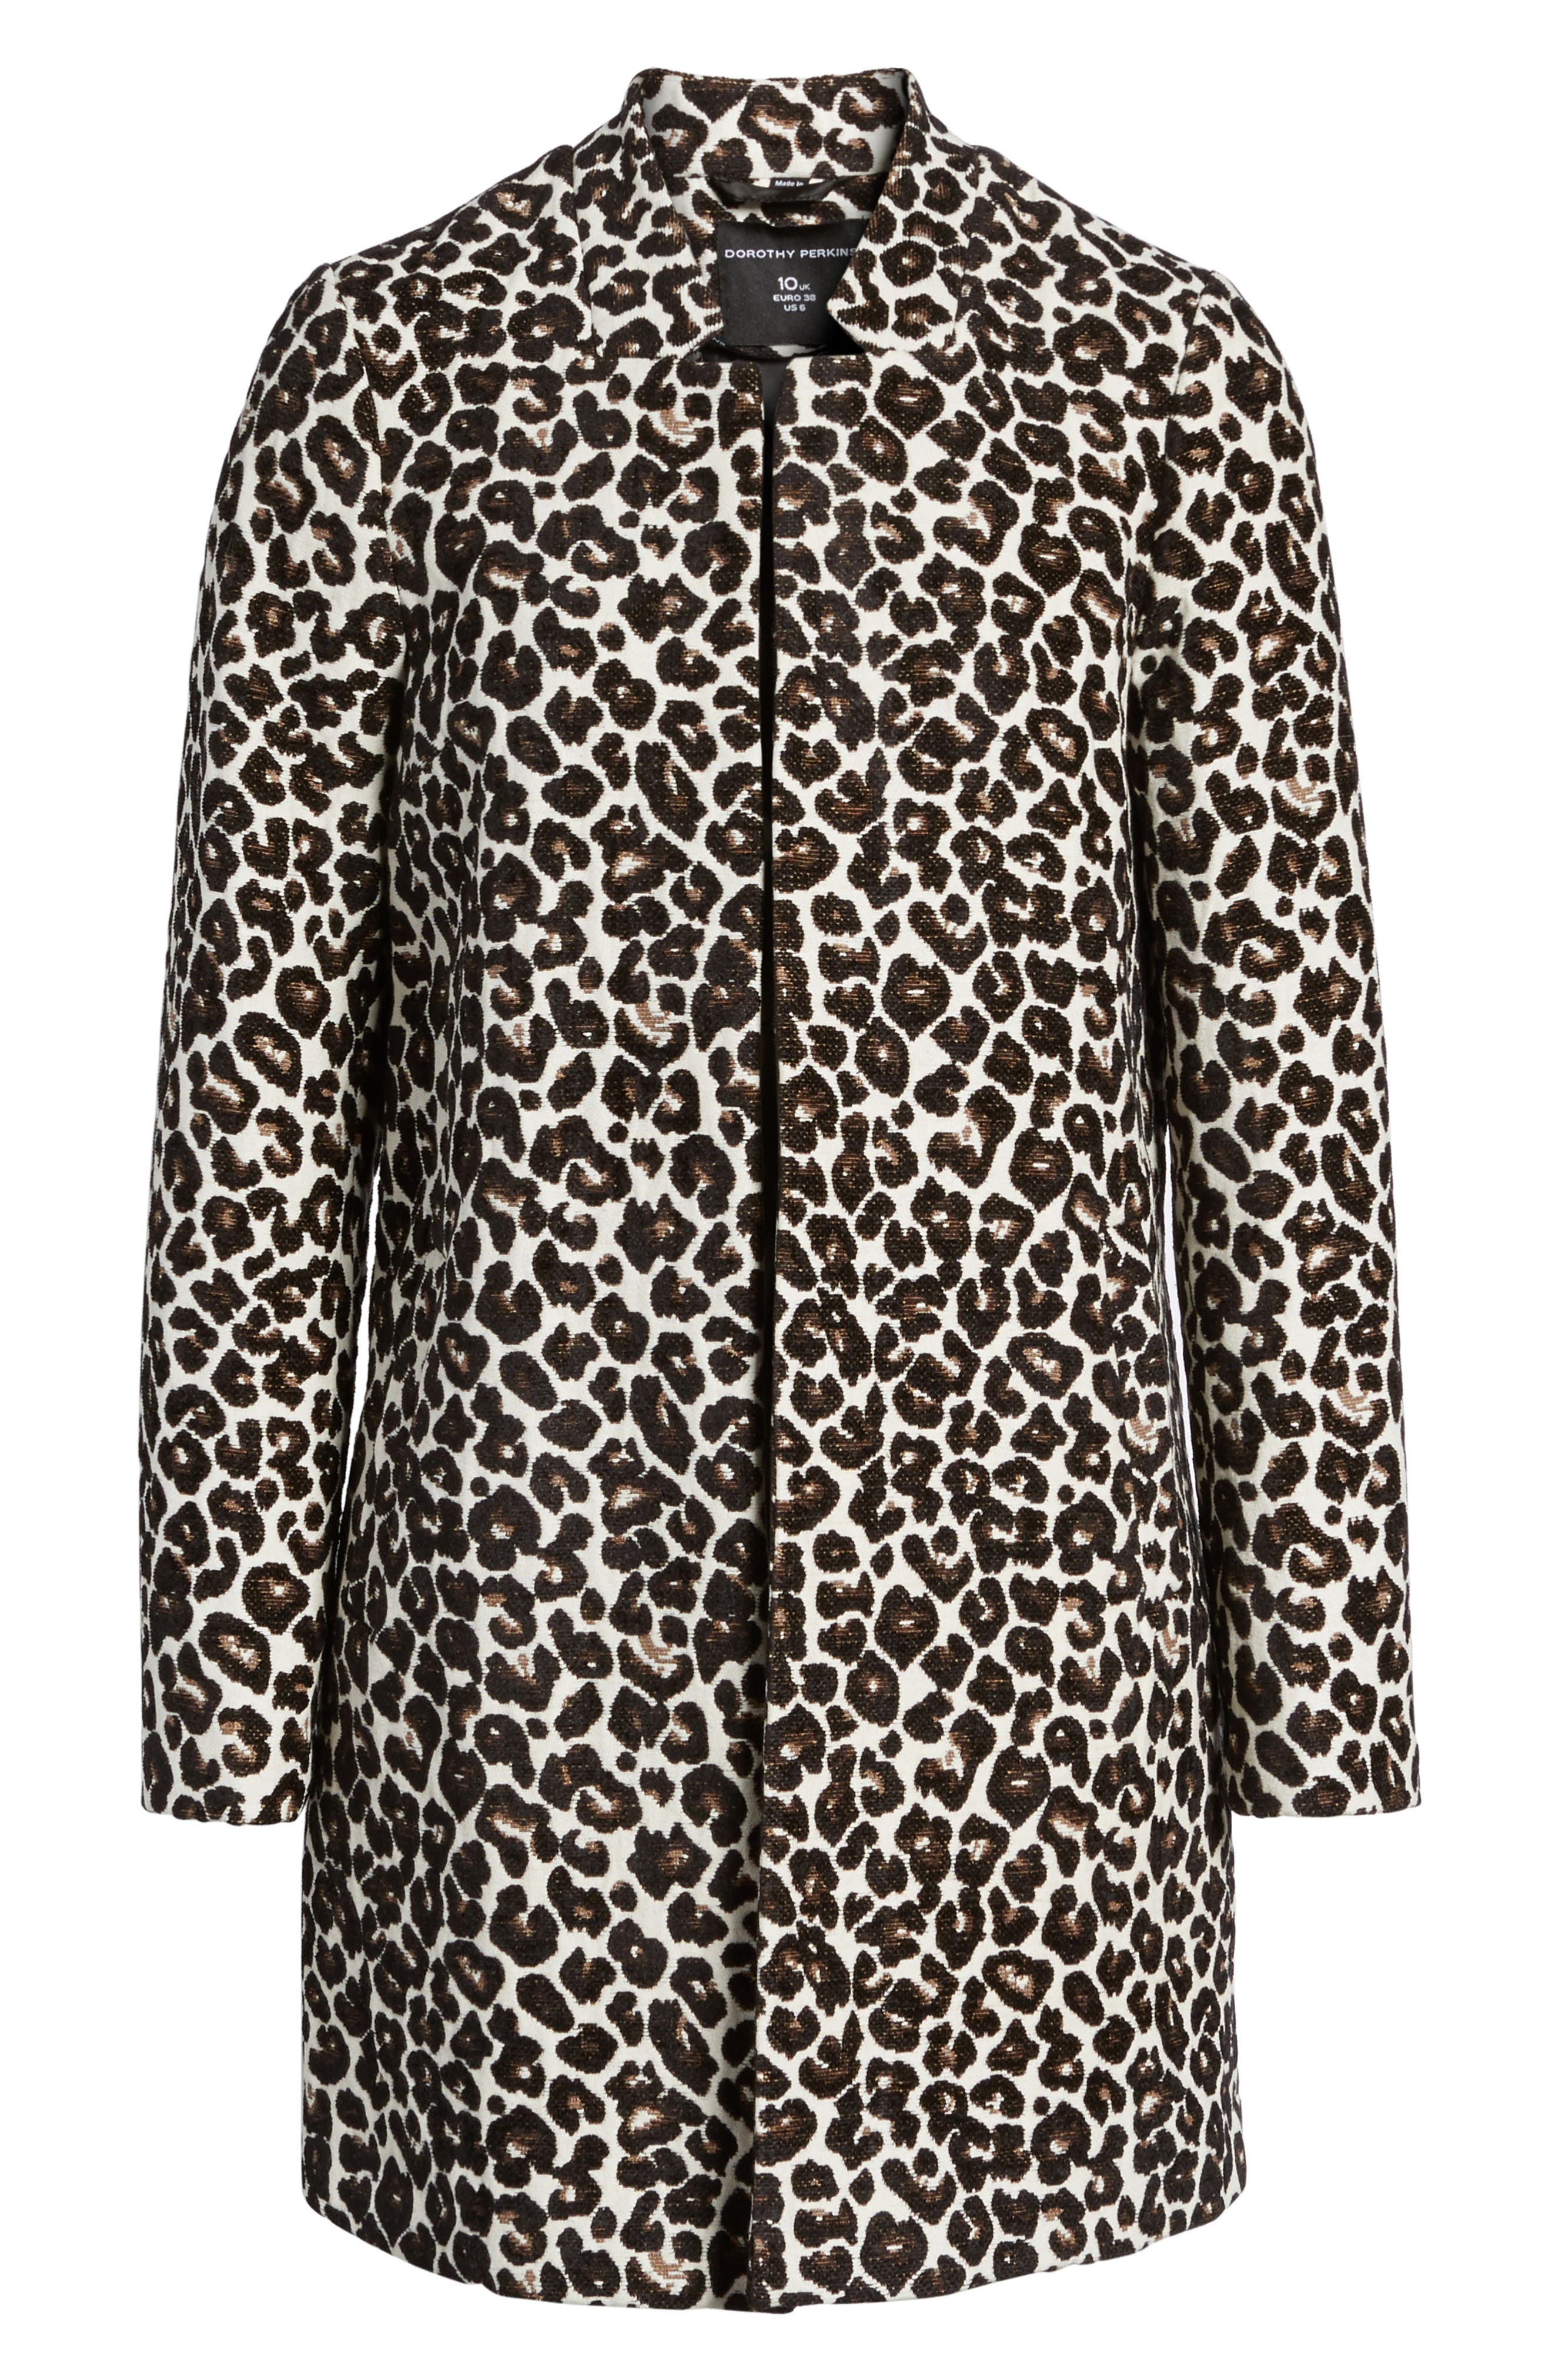 Leopard Print Car Coat,                             Alternate thumbnail 5, color,                             700